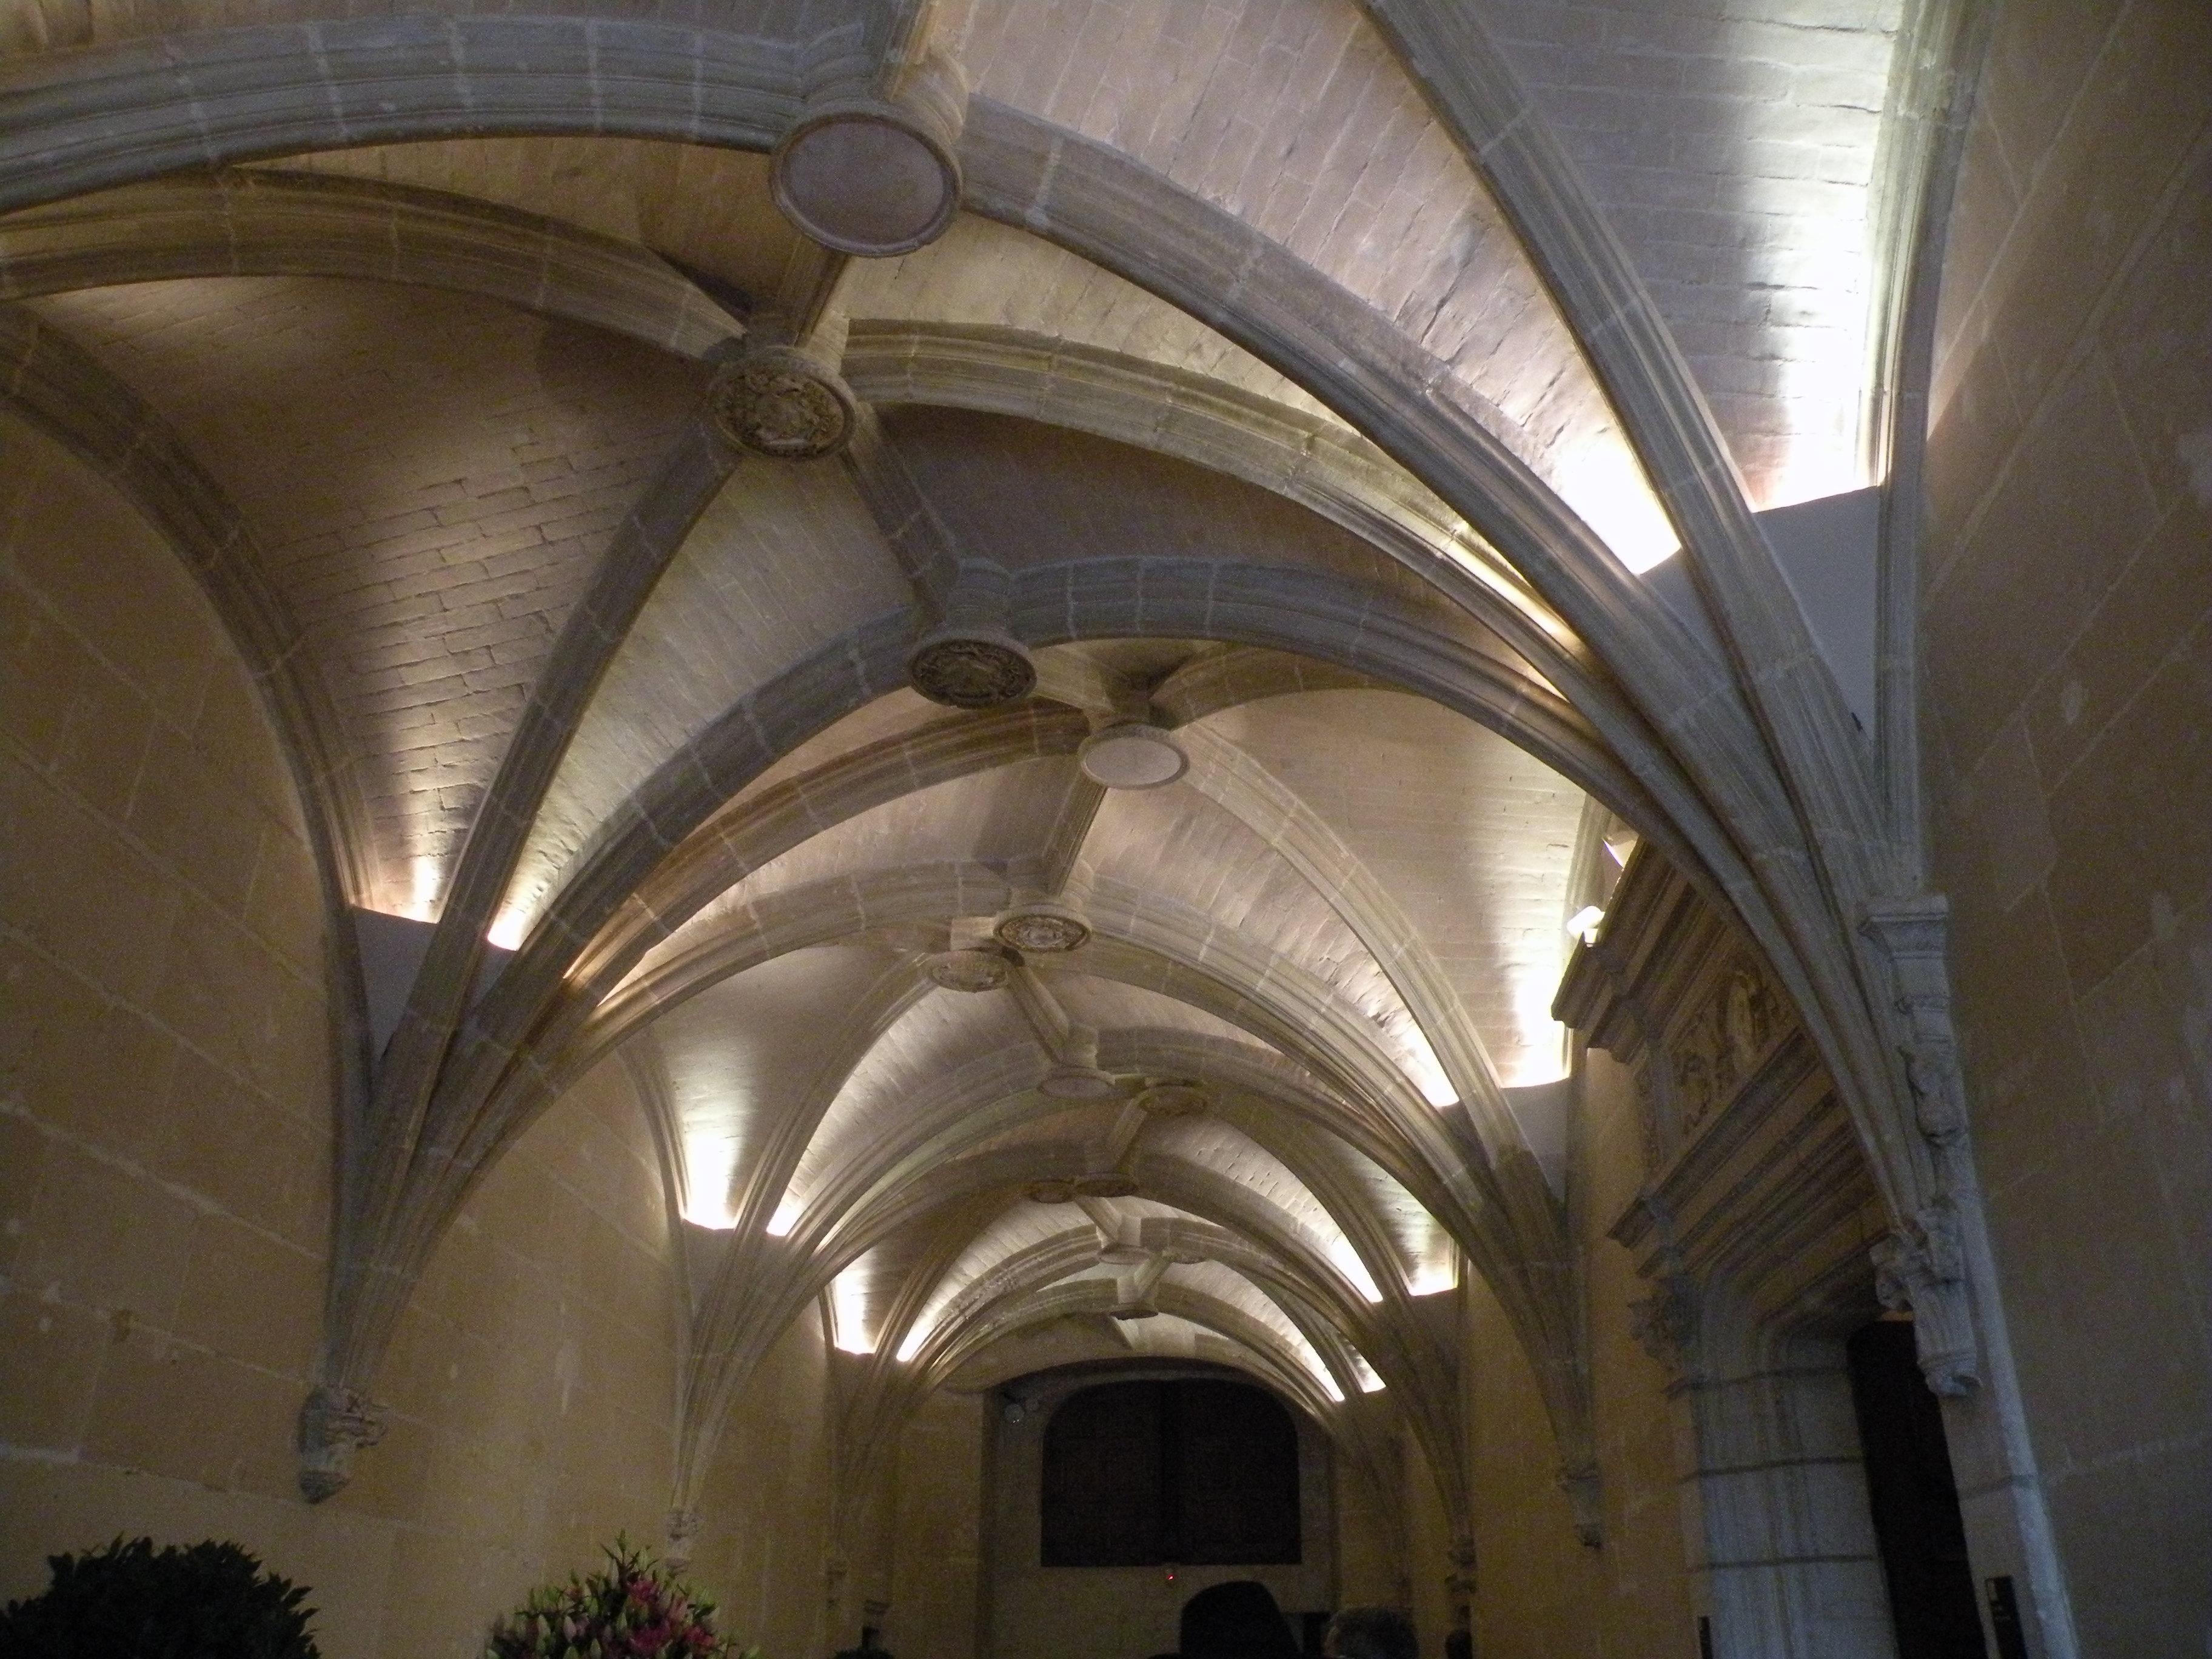 File:Interior of Château de Chenonceau 06.JPG - Wikimedia Commons